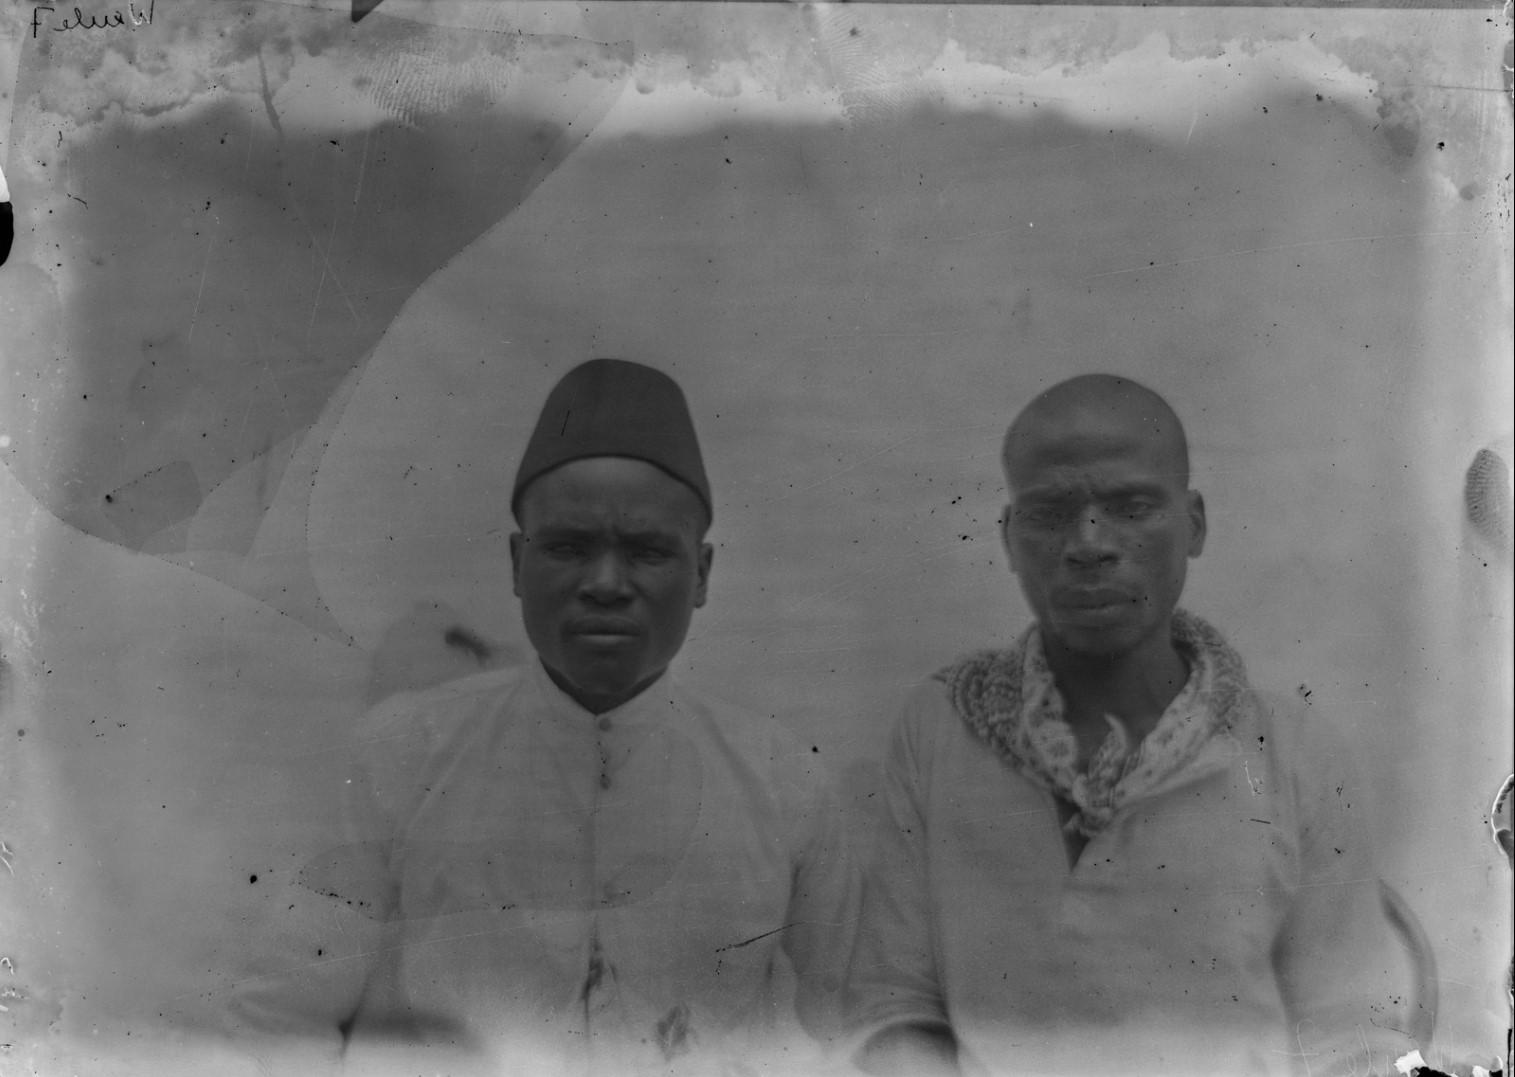 79. Портрет двух мужчин